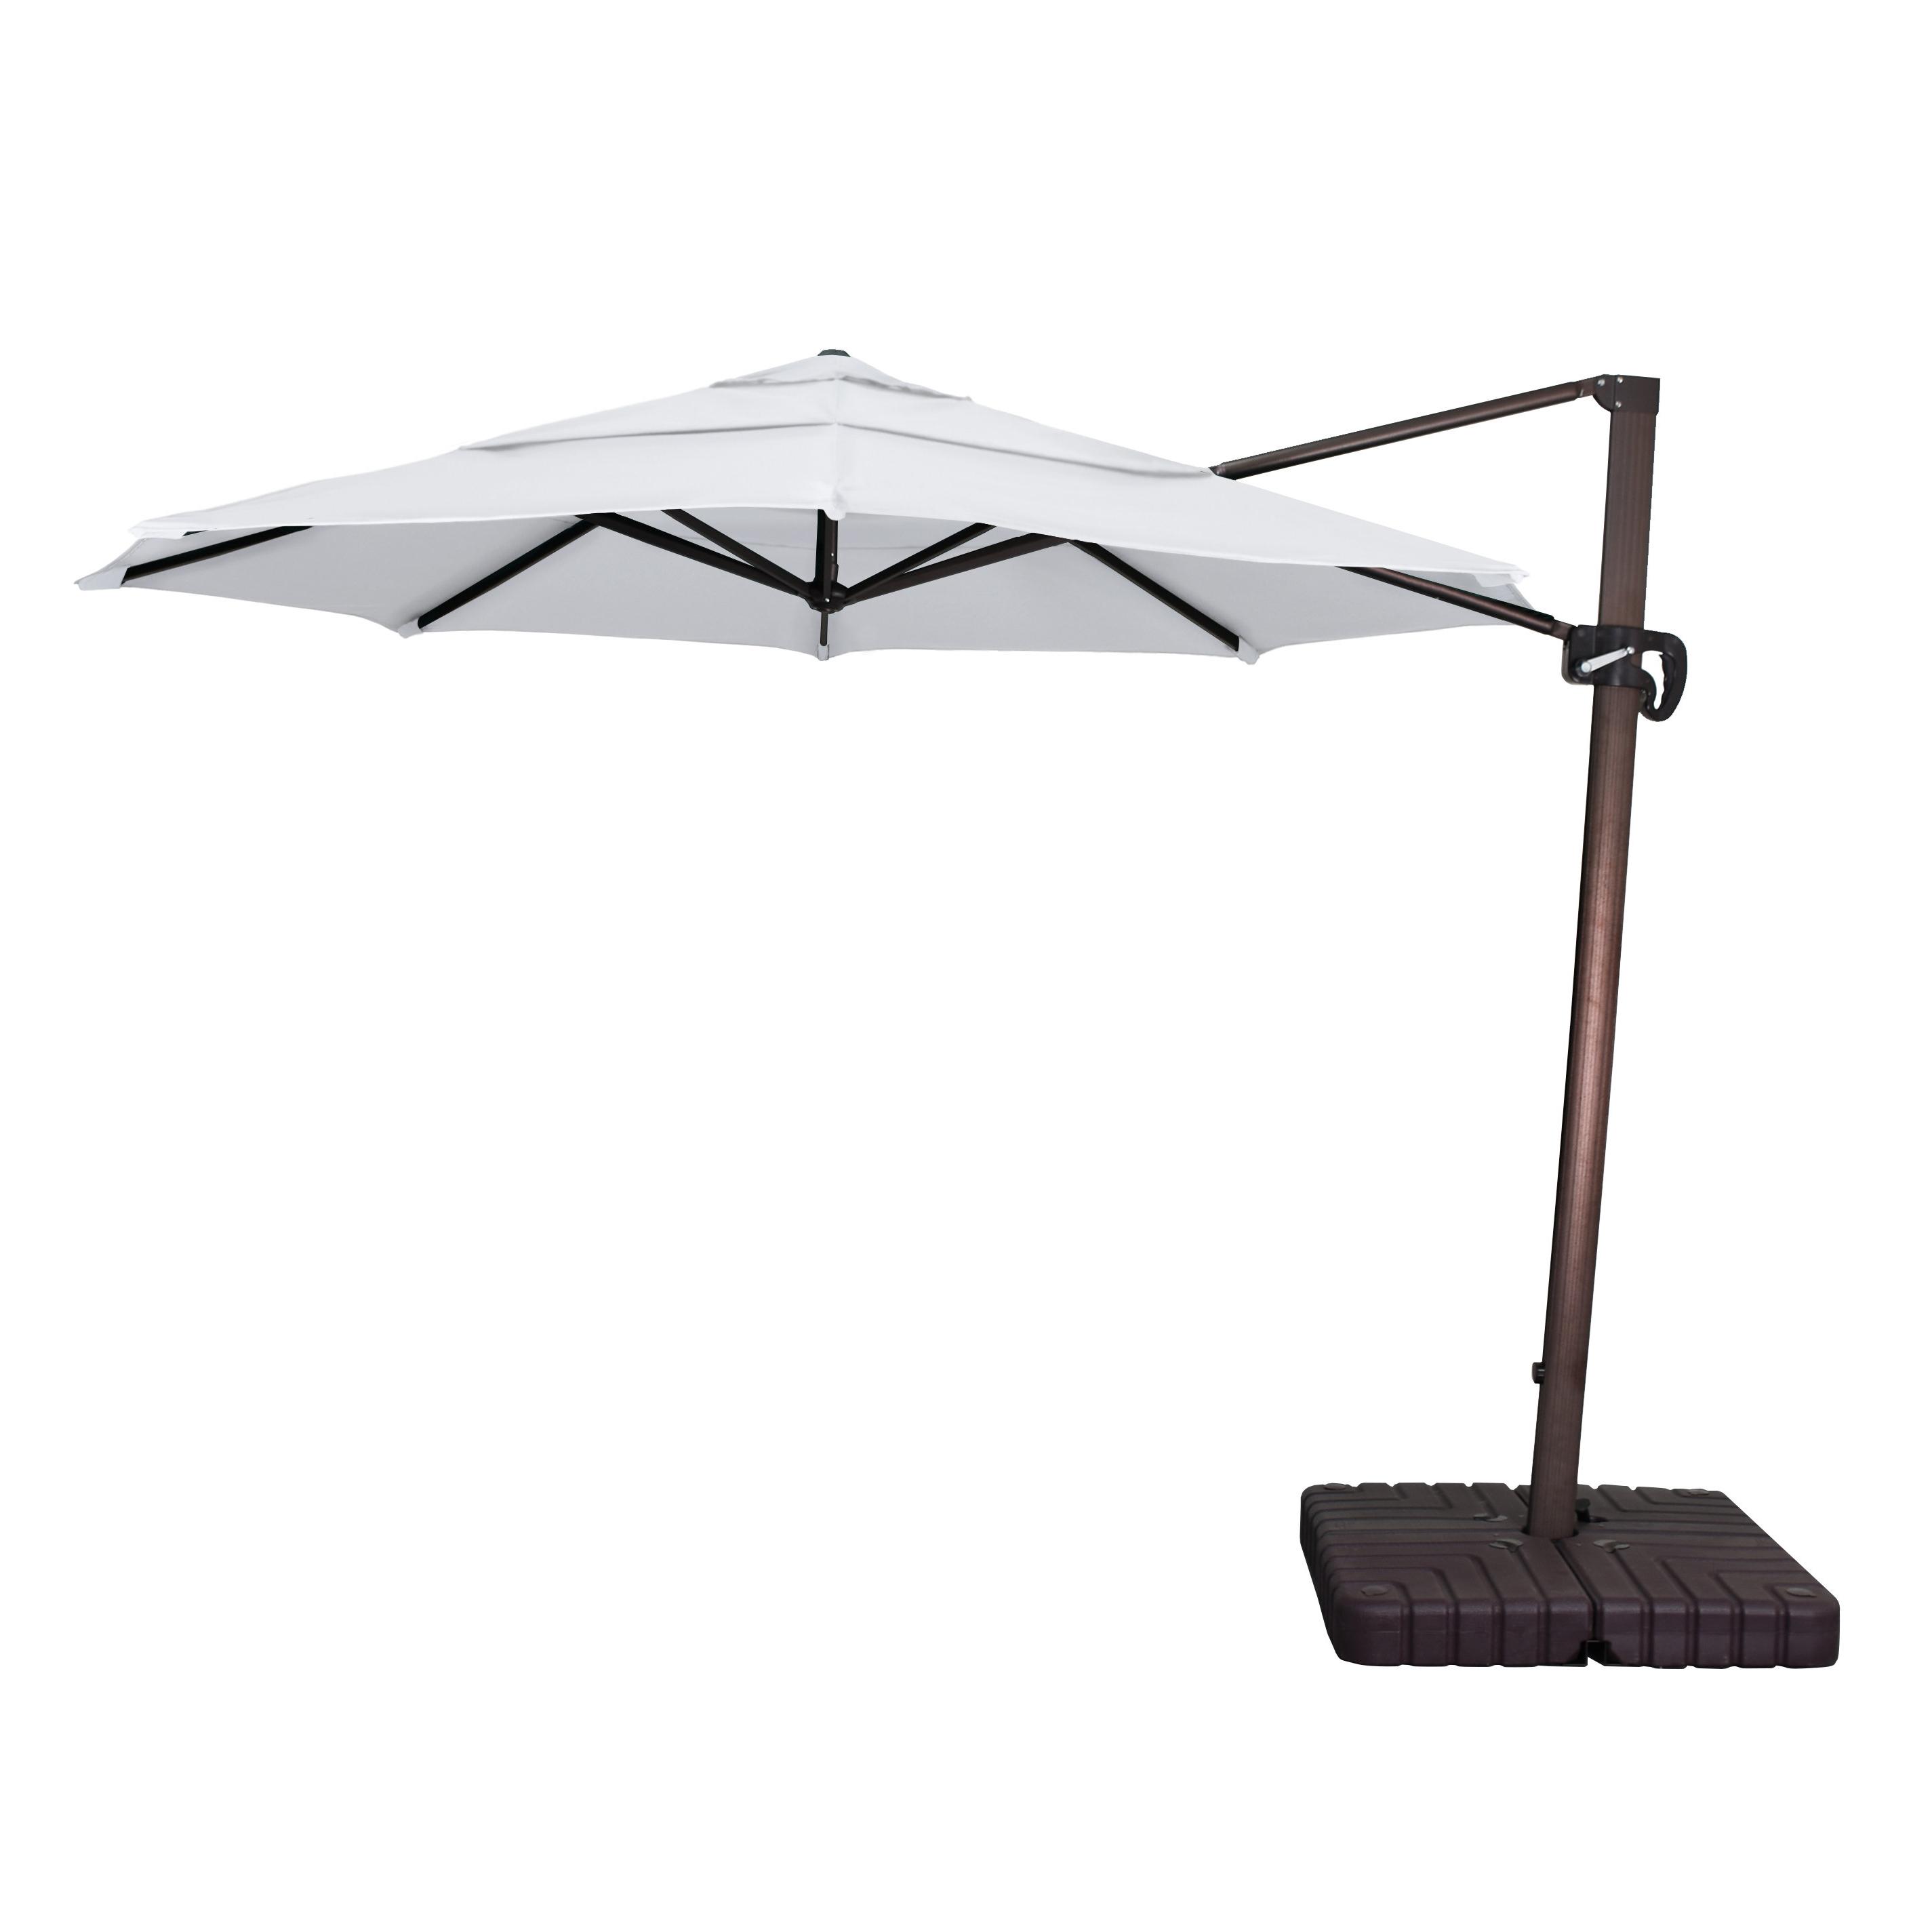 Favorite Lennie Cantilever Sunbrella Umbrellas Within Sol 72 Outdoor Carlisle Cantilever Sunbrella Umbrella (View 5 of 20)